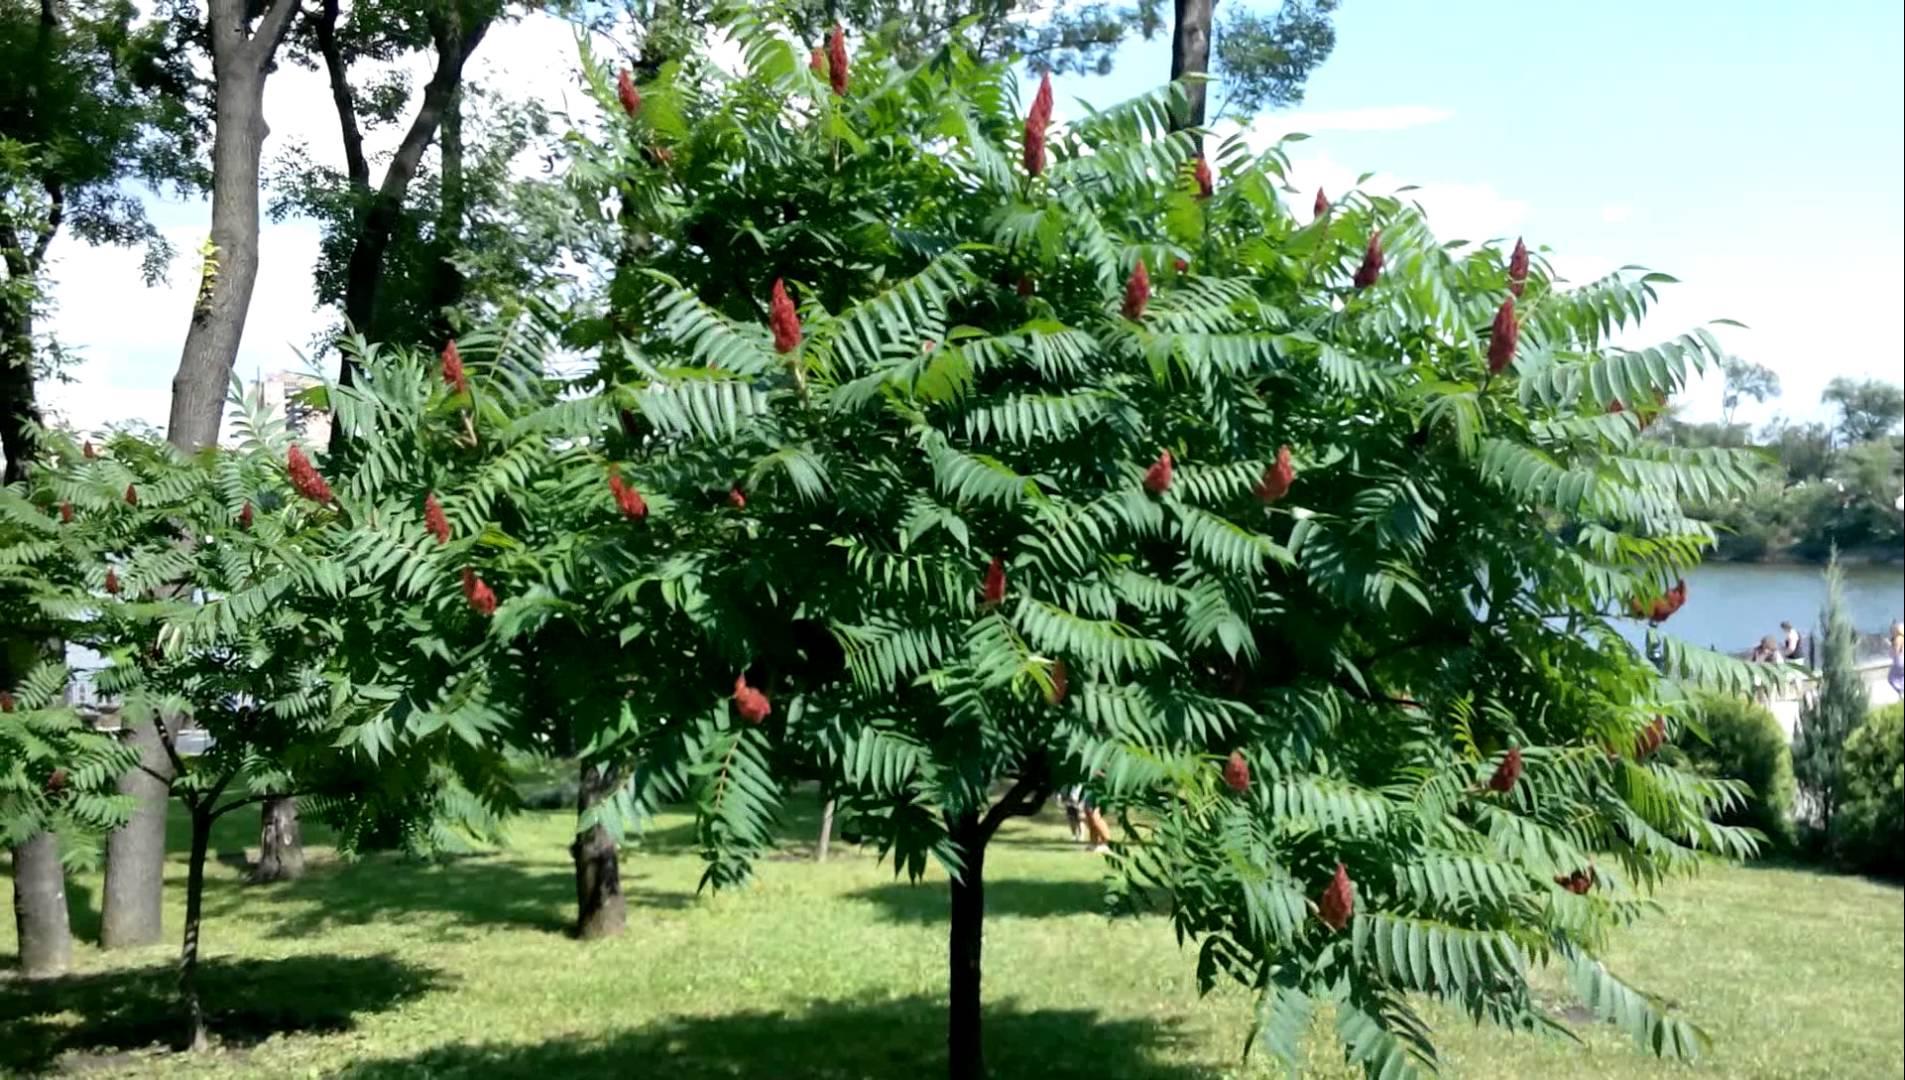 Уксусное дерево фото 3 фотография